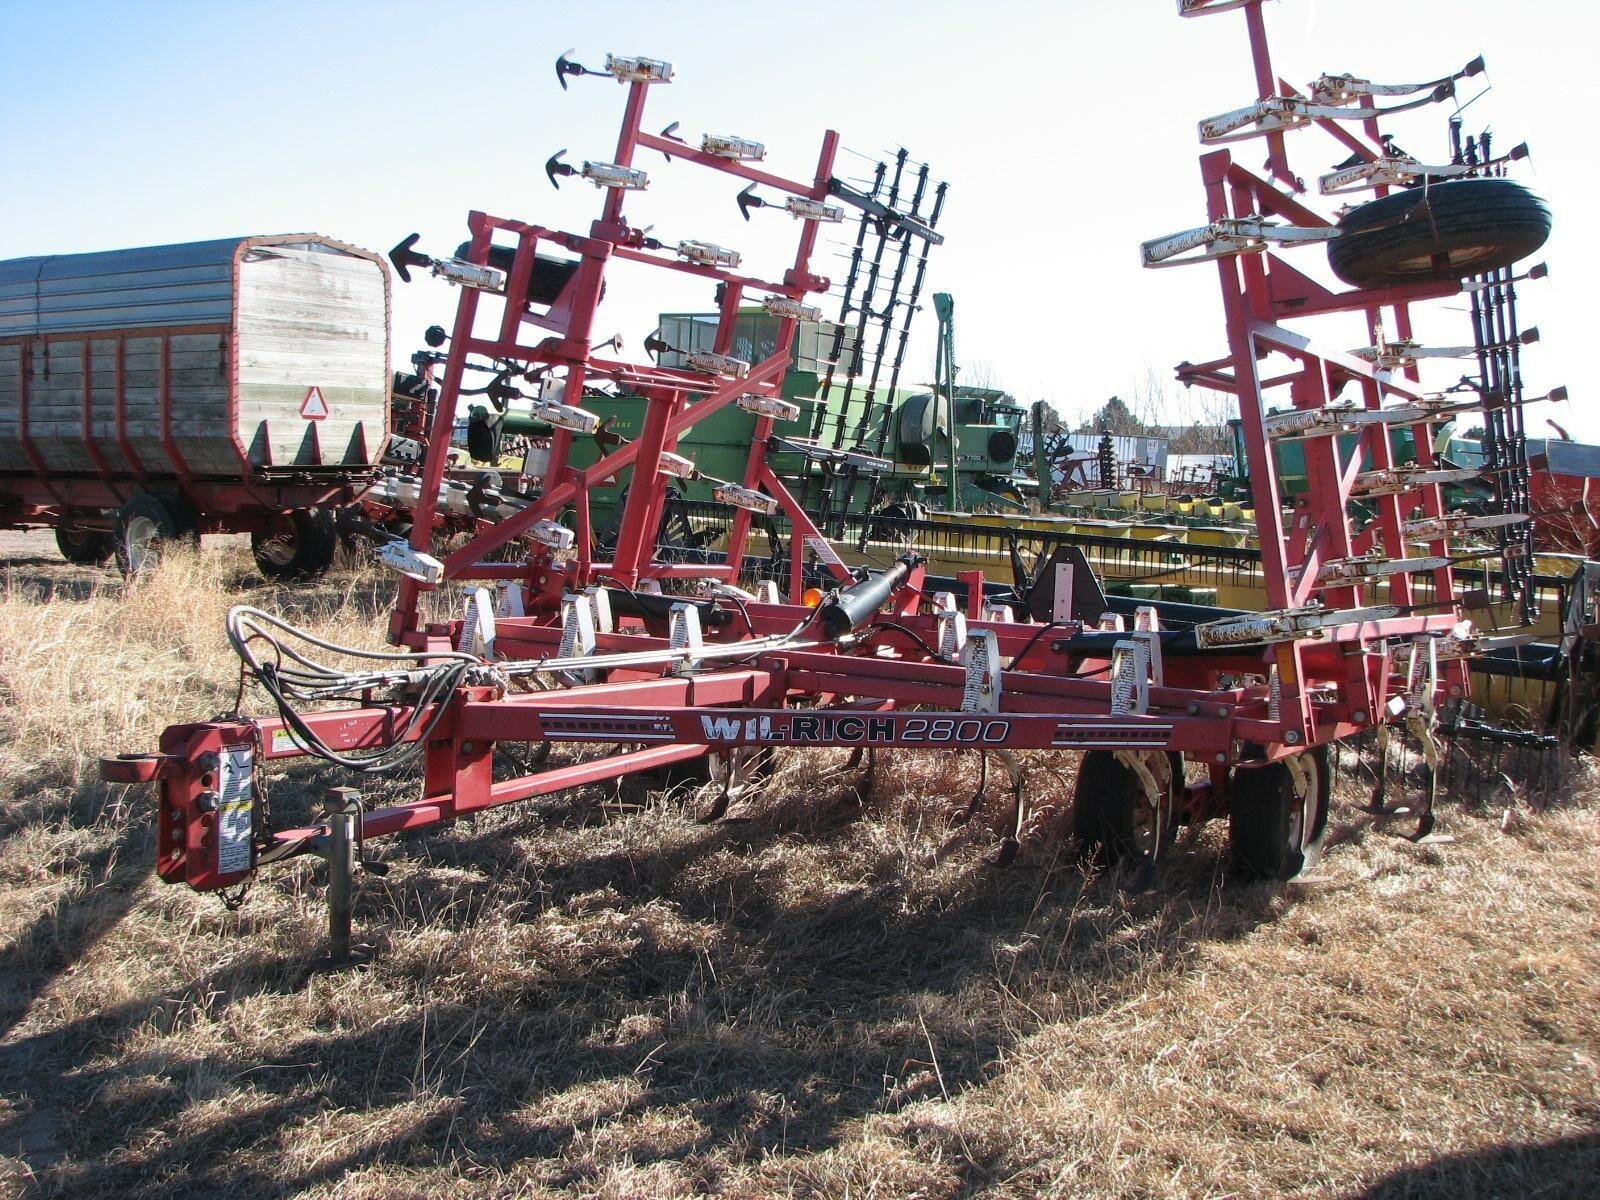 Wil-Rich 2800 Field Cultivator